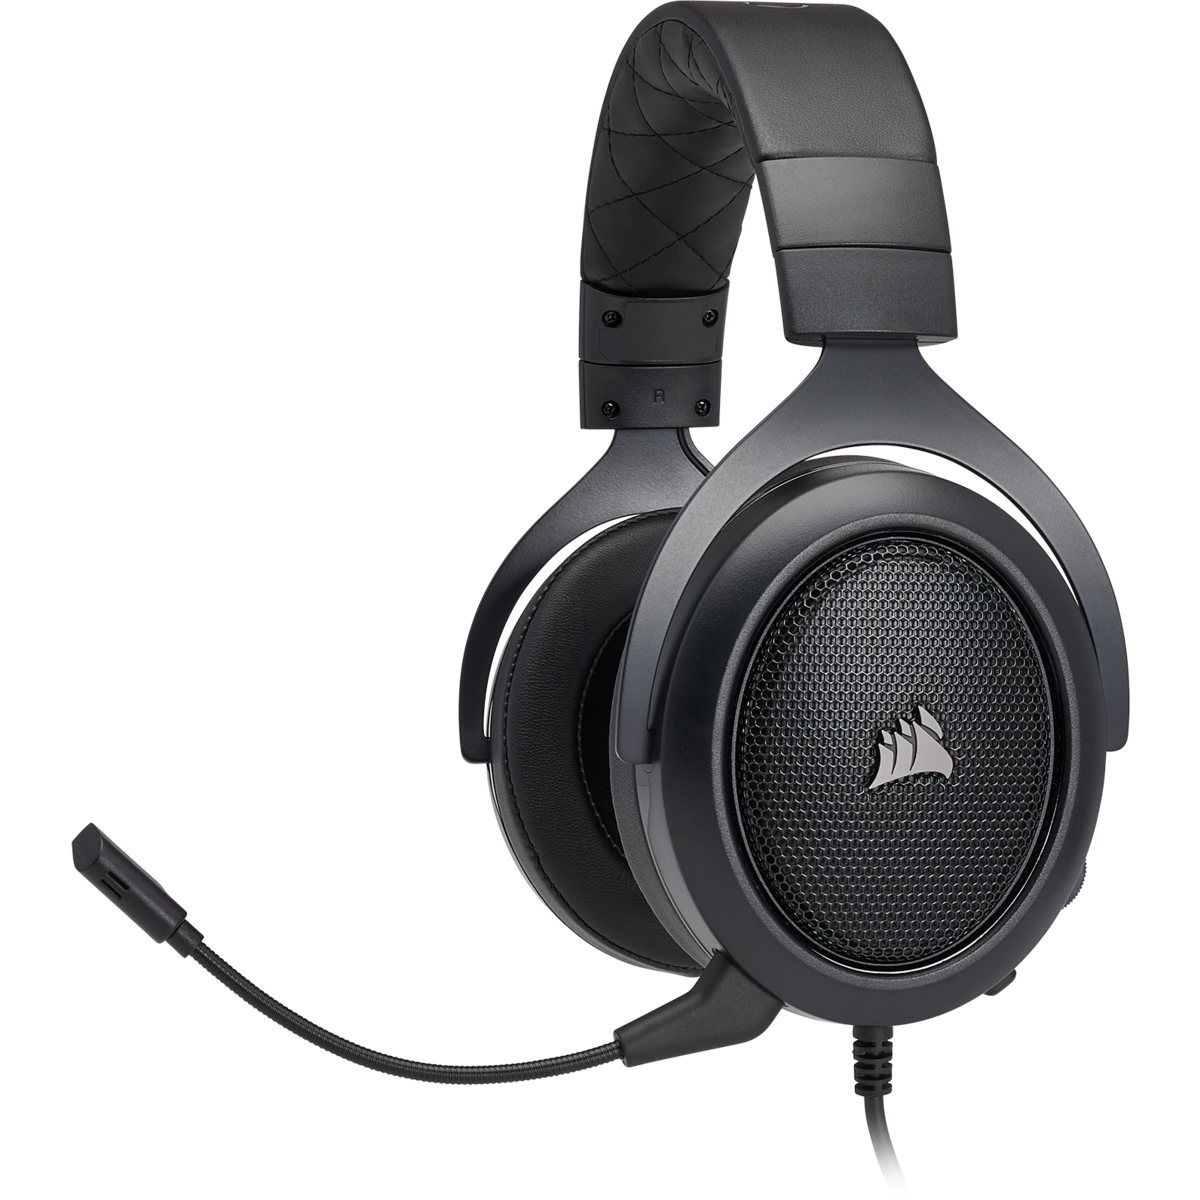 Headphones Corsair HS50 Stereo Gaming Headset